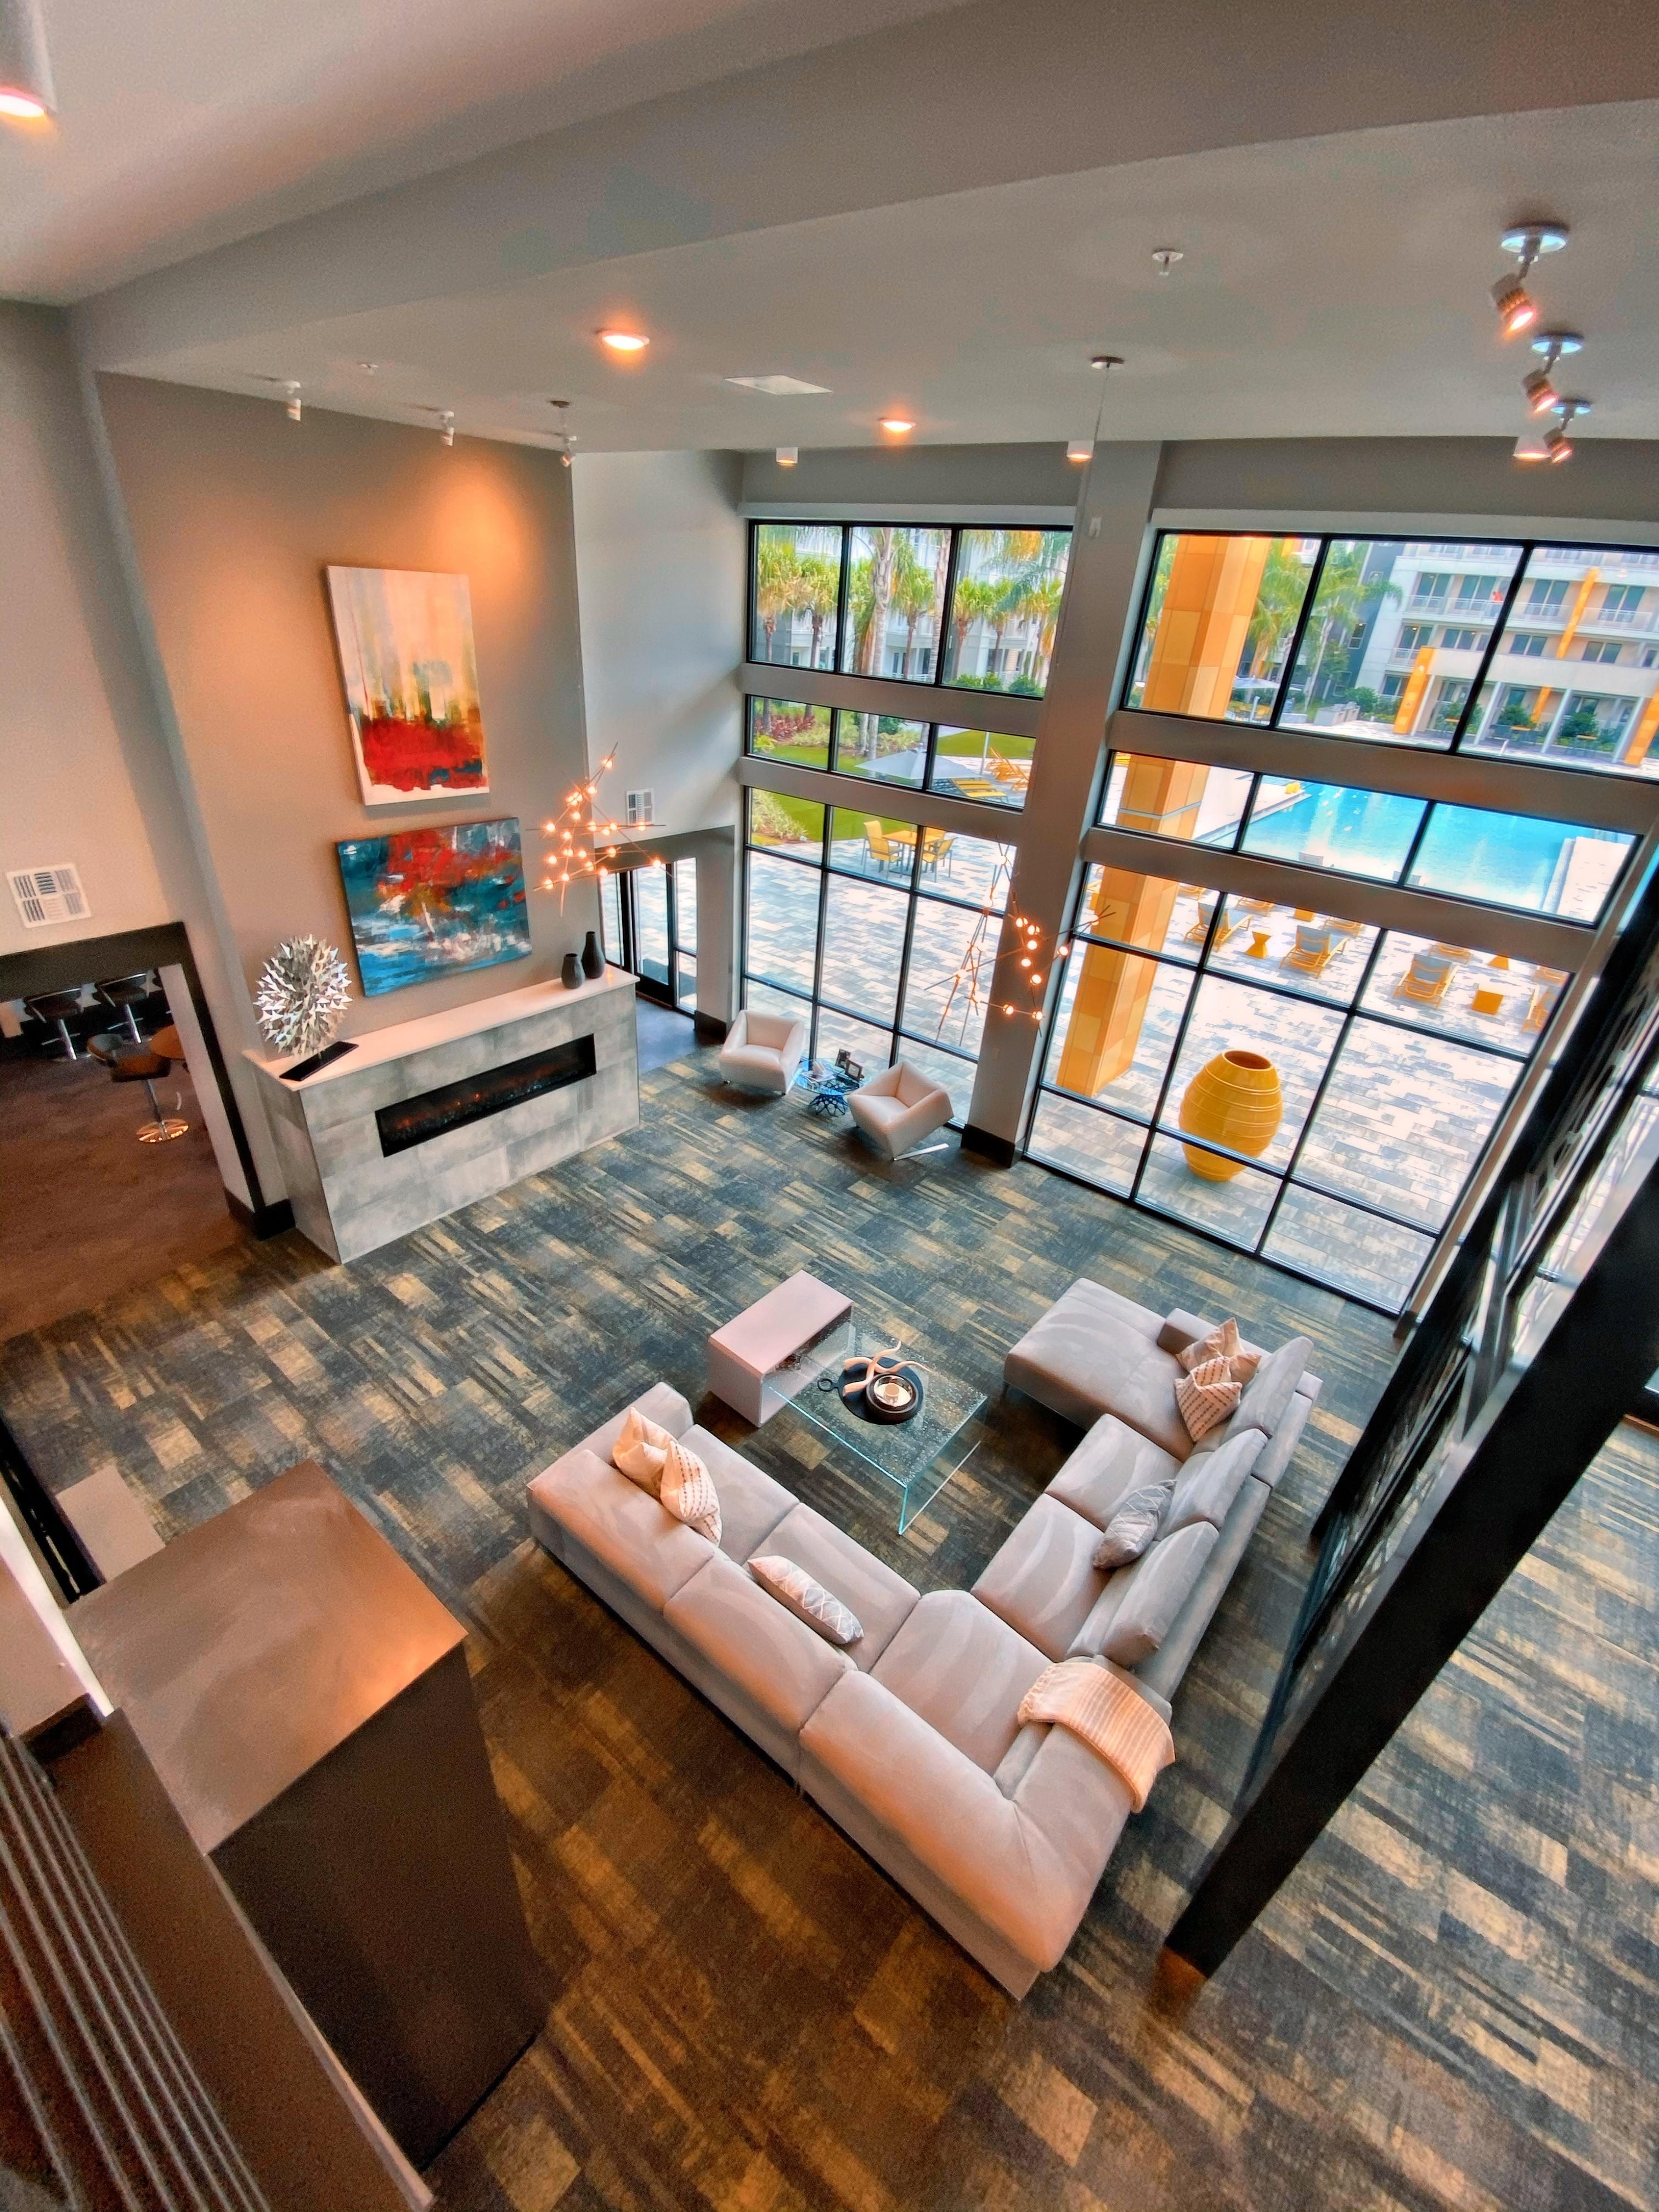 Apartments Near Coastal Law Fusion for Florida Coastal School of Law Students in Jacksonville, FL